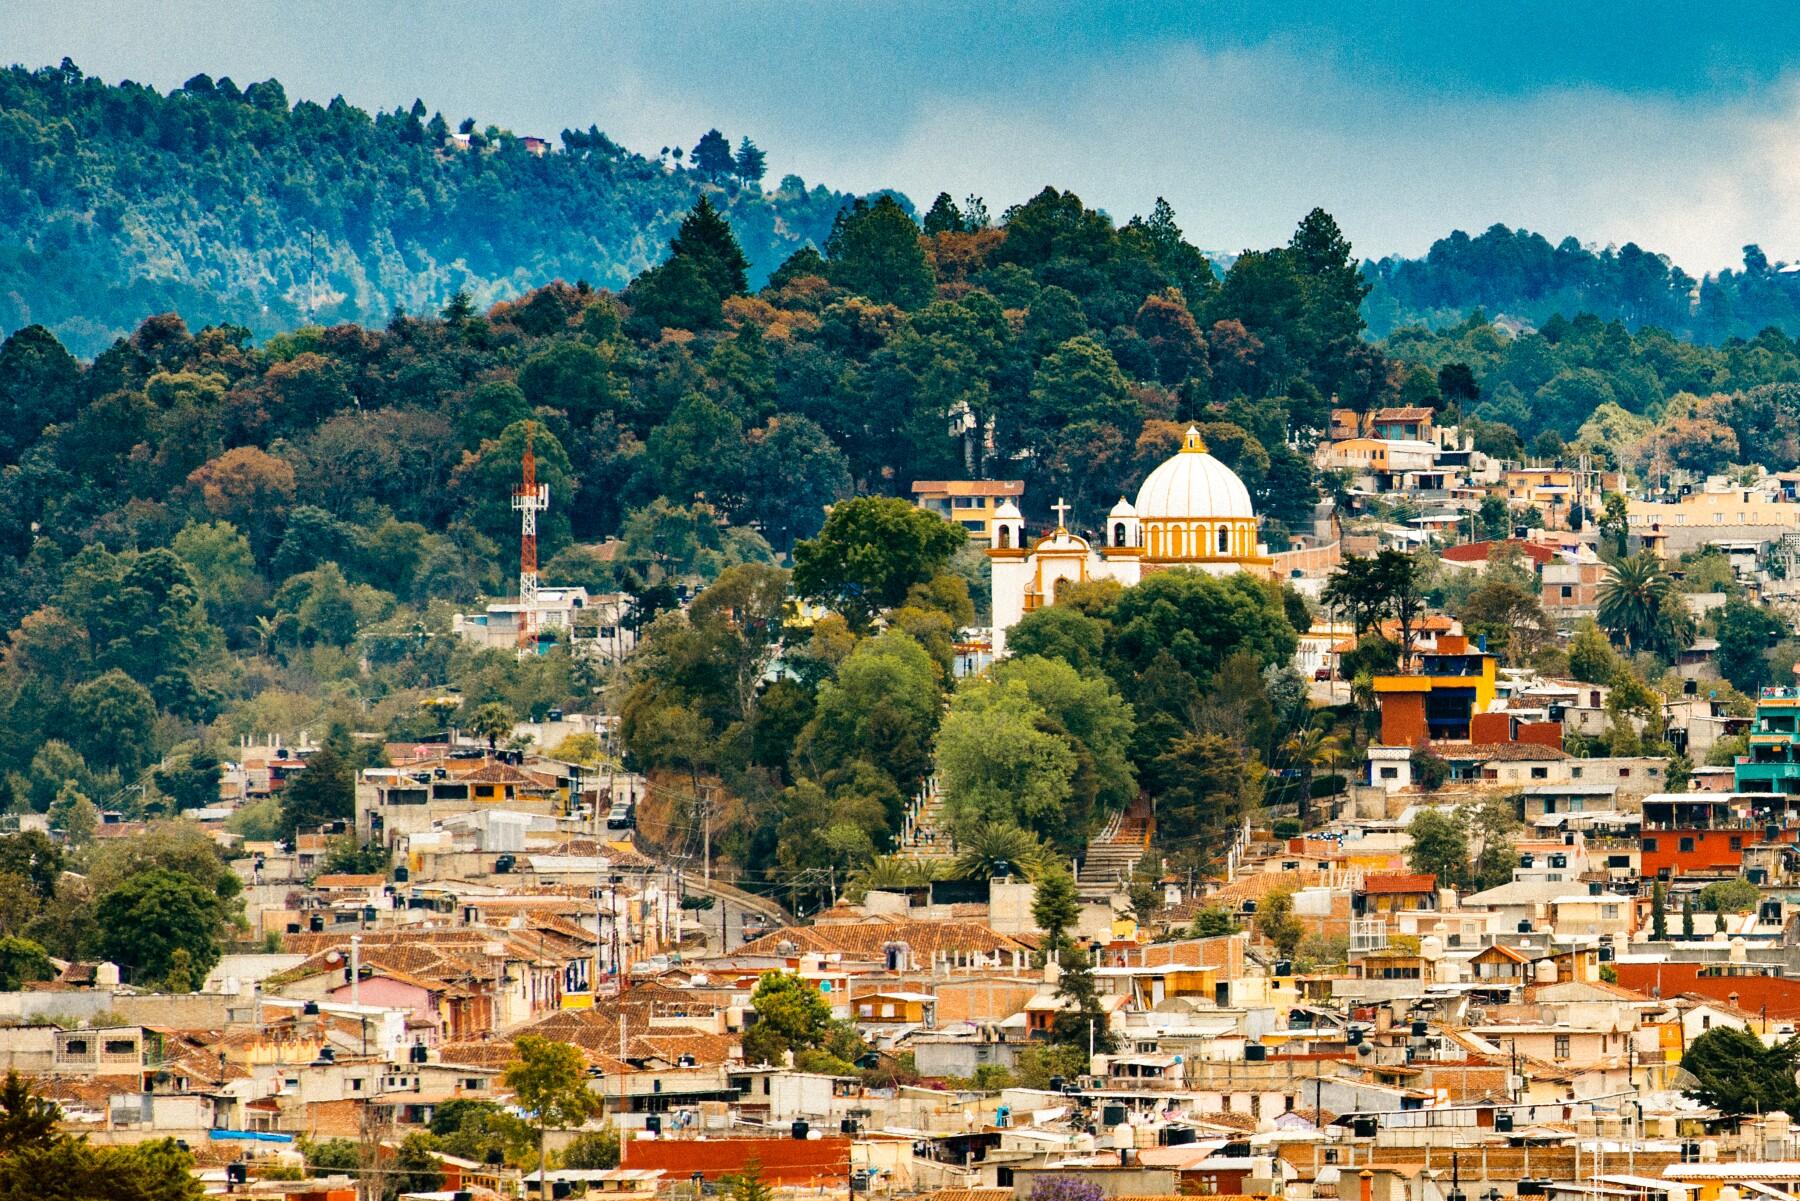 San Cristobal de las Casas Chiapas Mexico